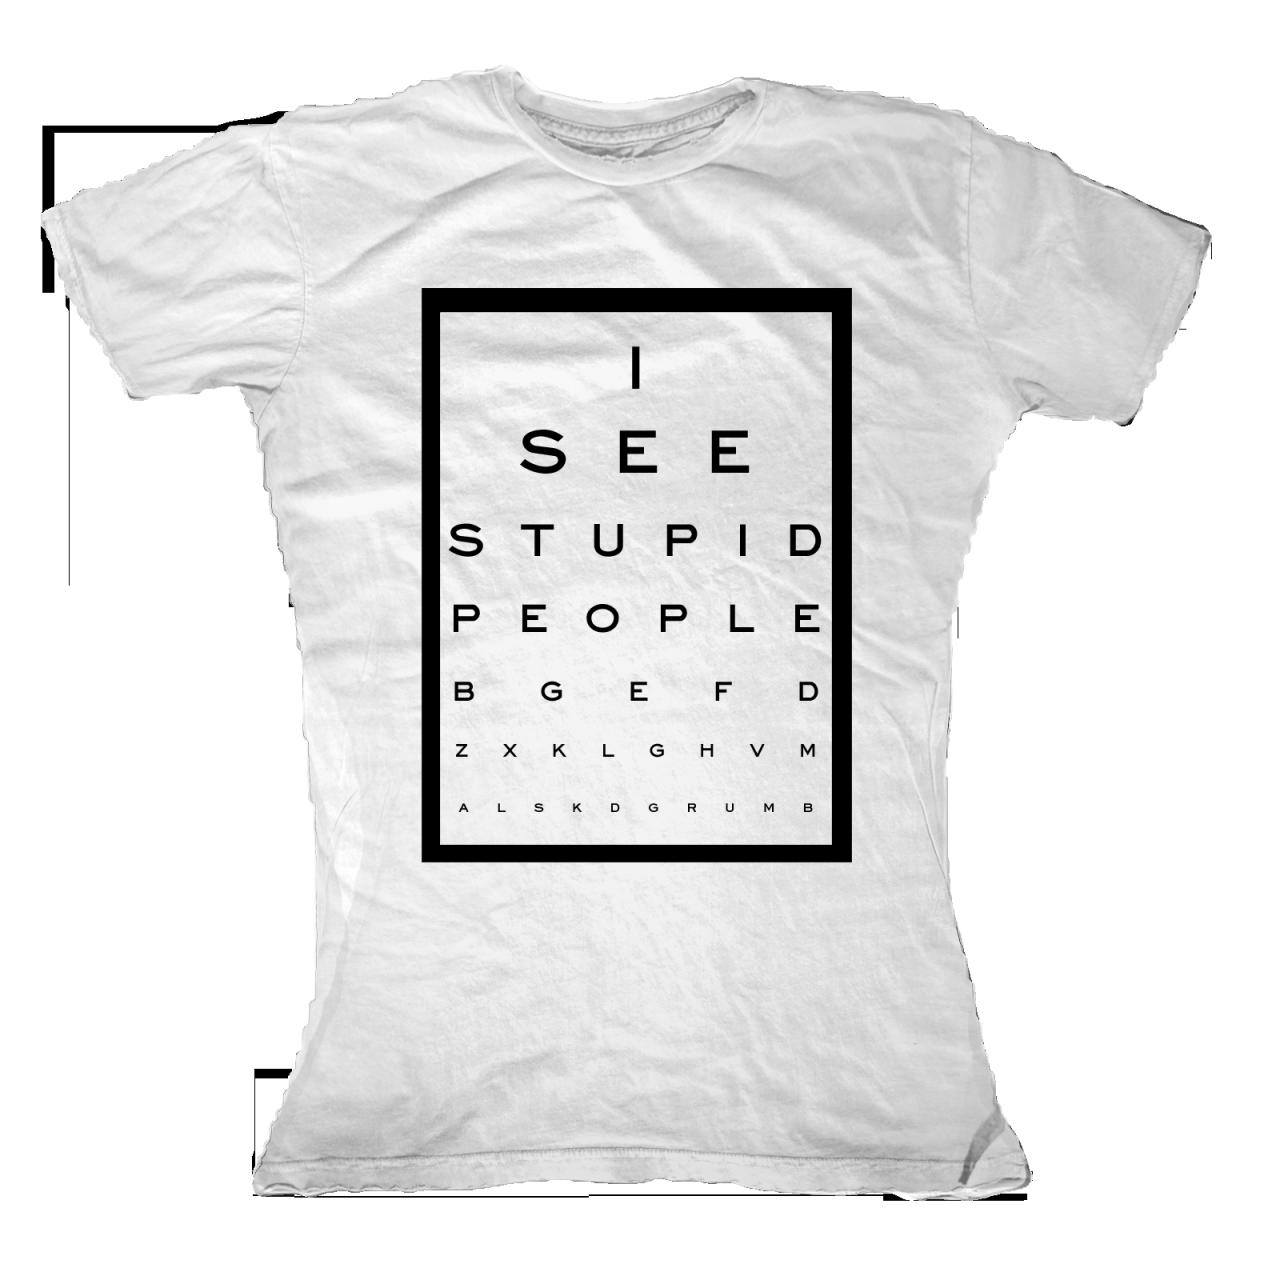 c2367d2c I See Stupid People T-Shirt - First Amendment Tees Co. Inc.